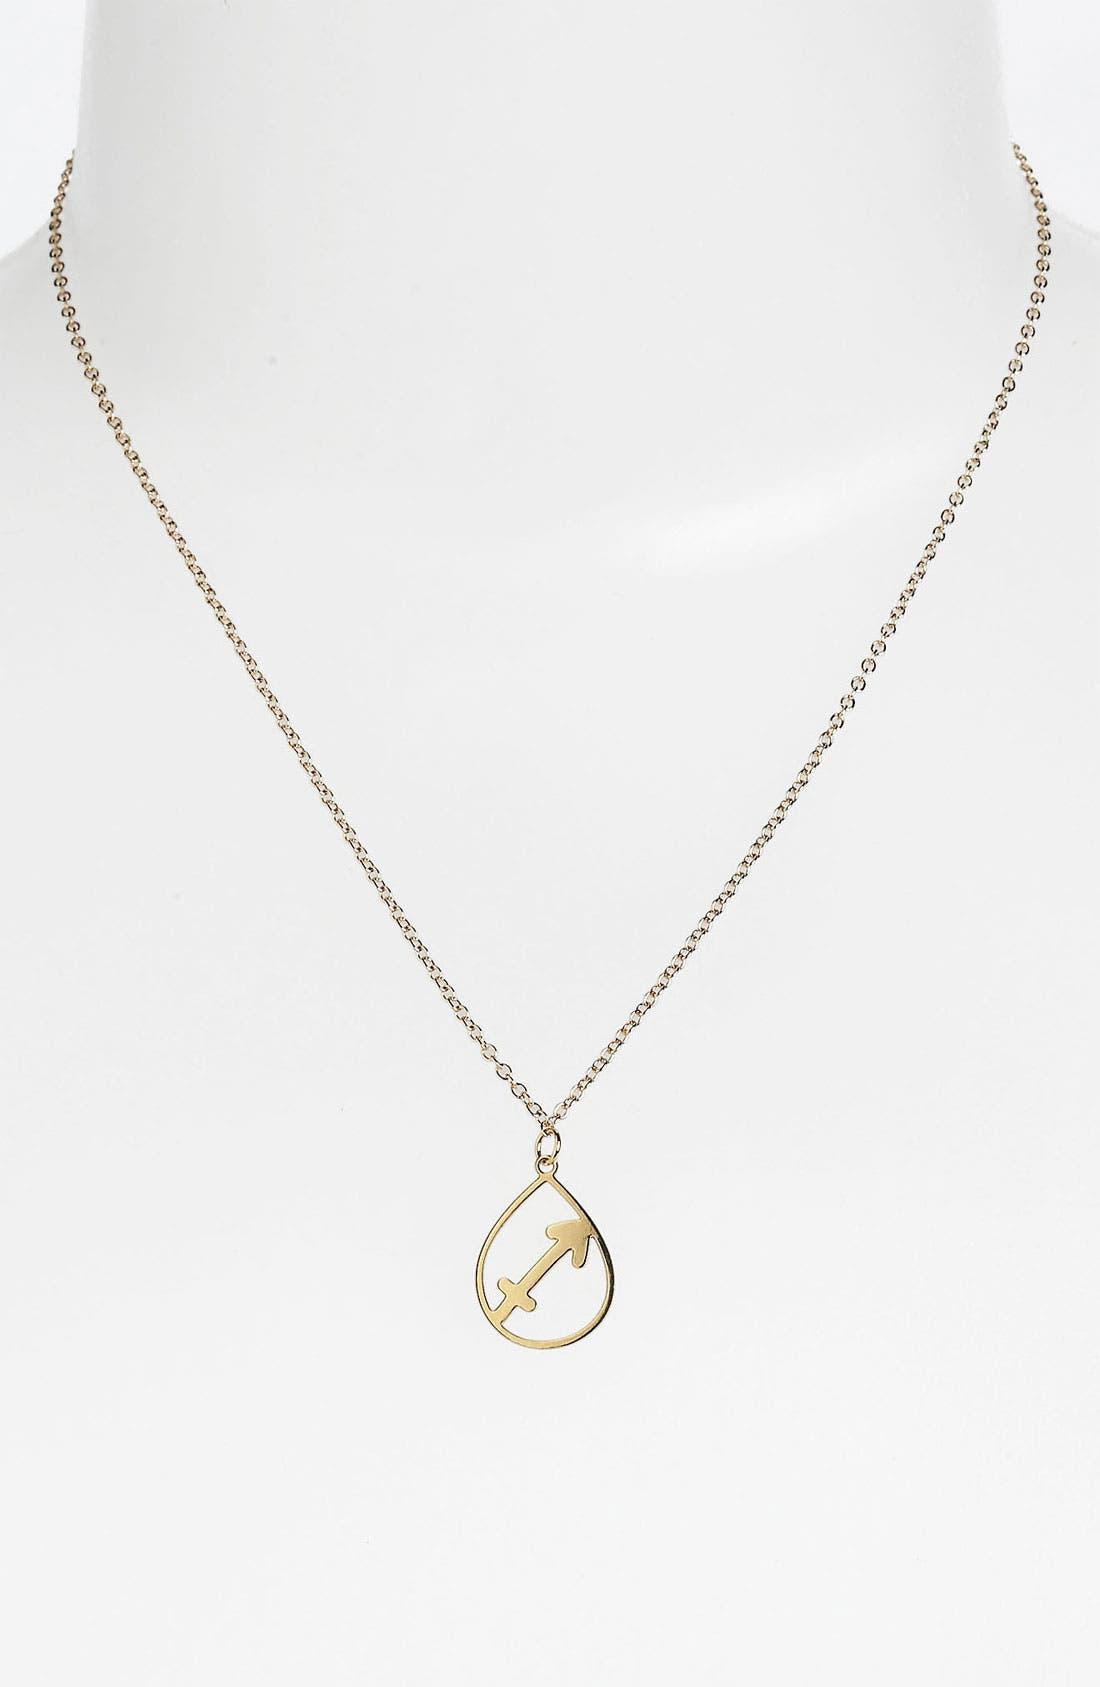 Alternate Image 1 Selected - Kris Nations 'Sagittarius' Necklace